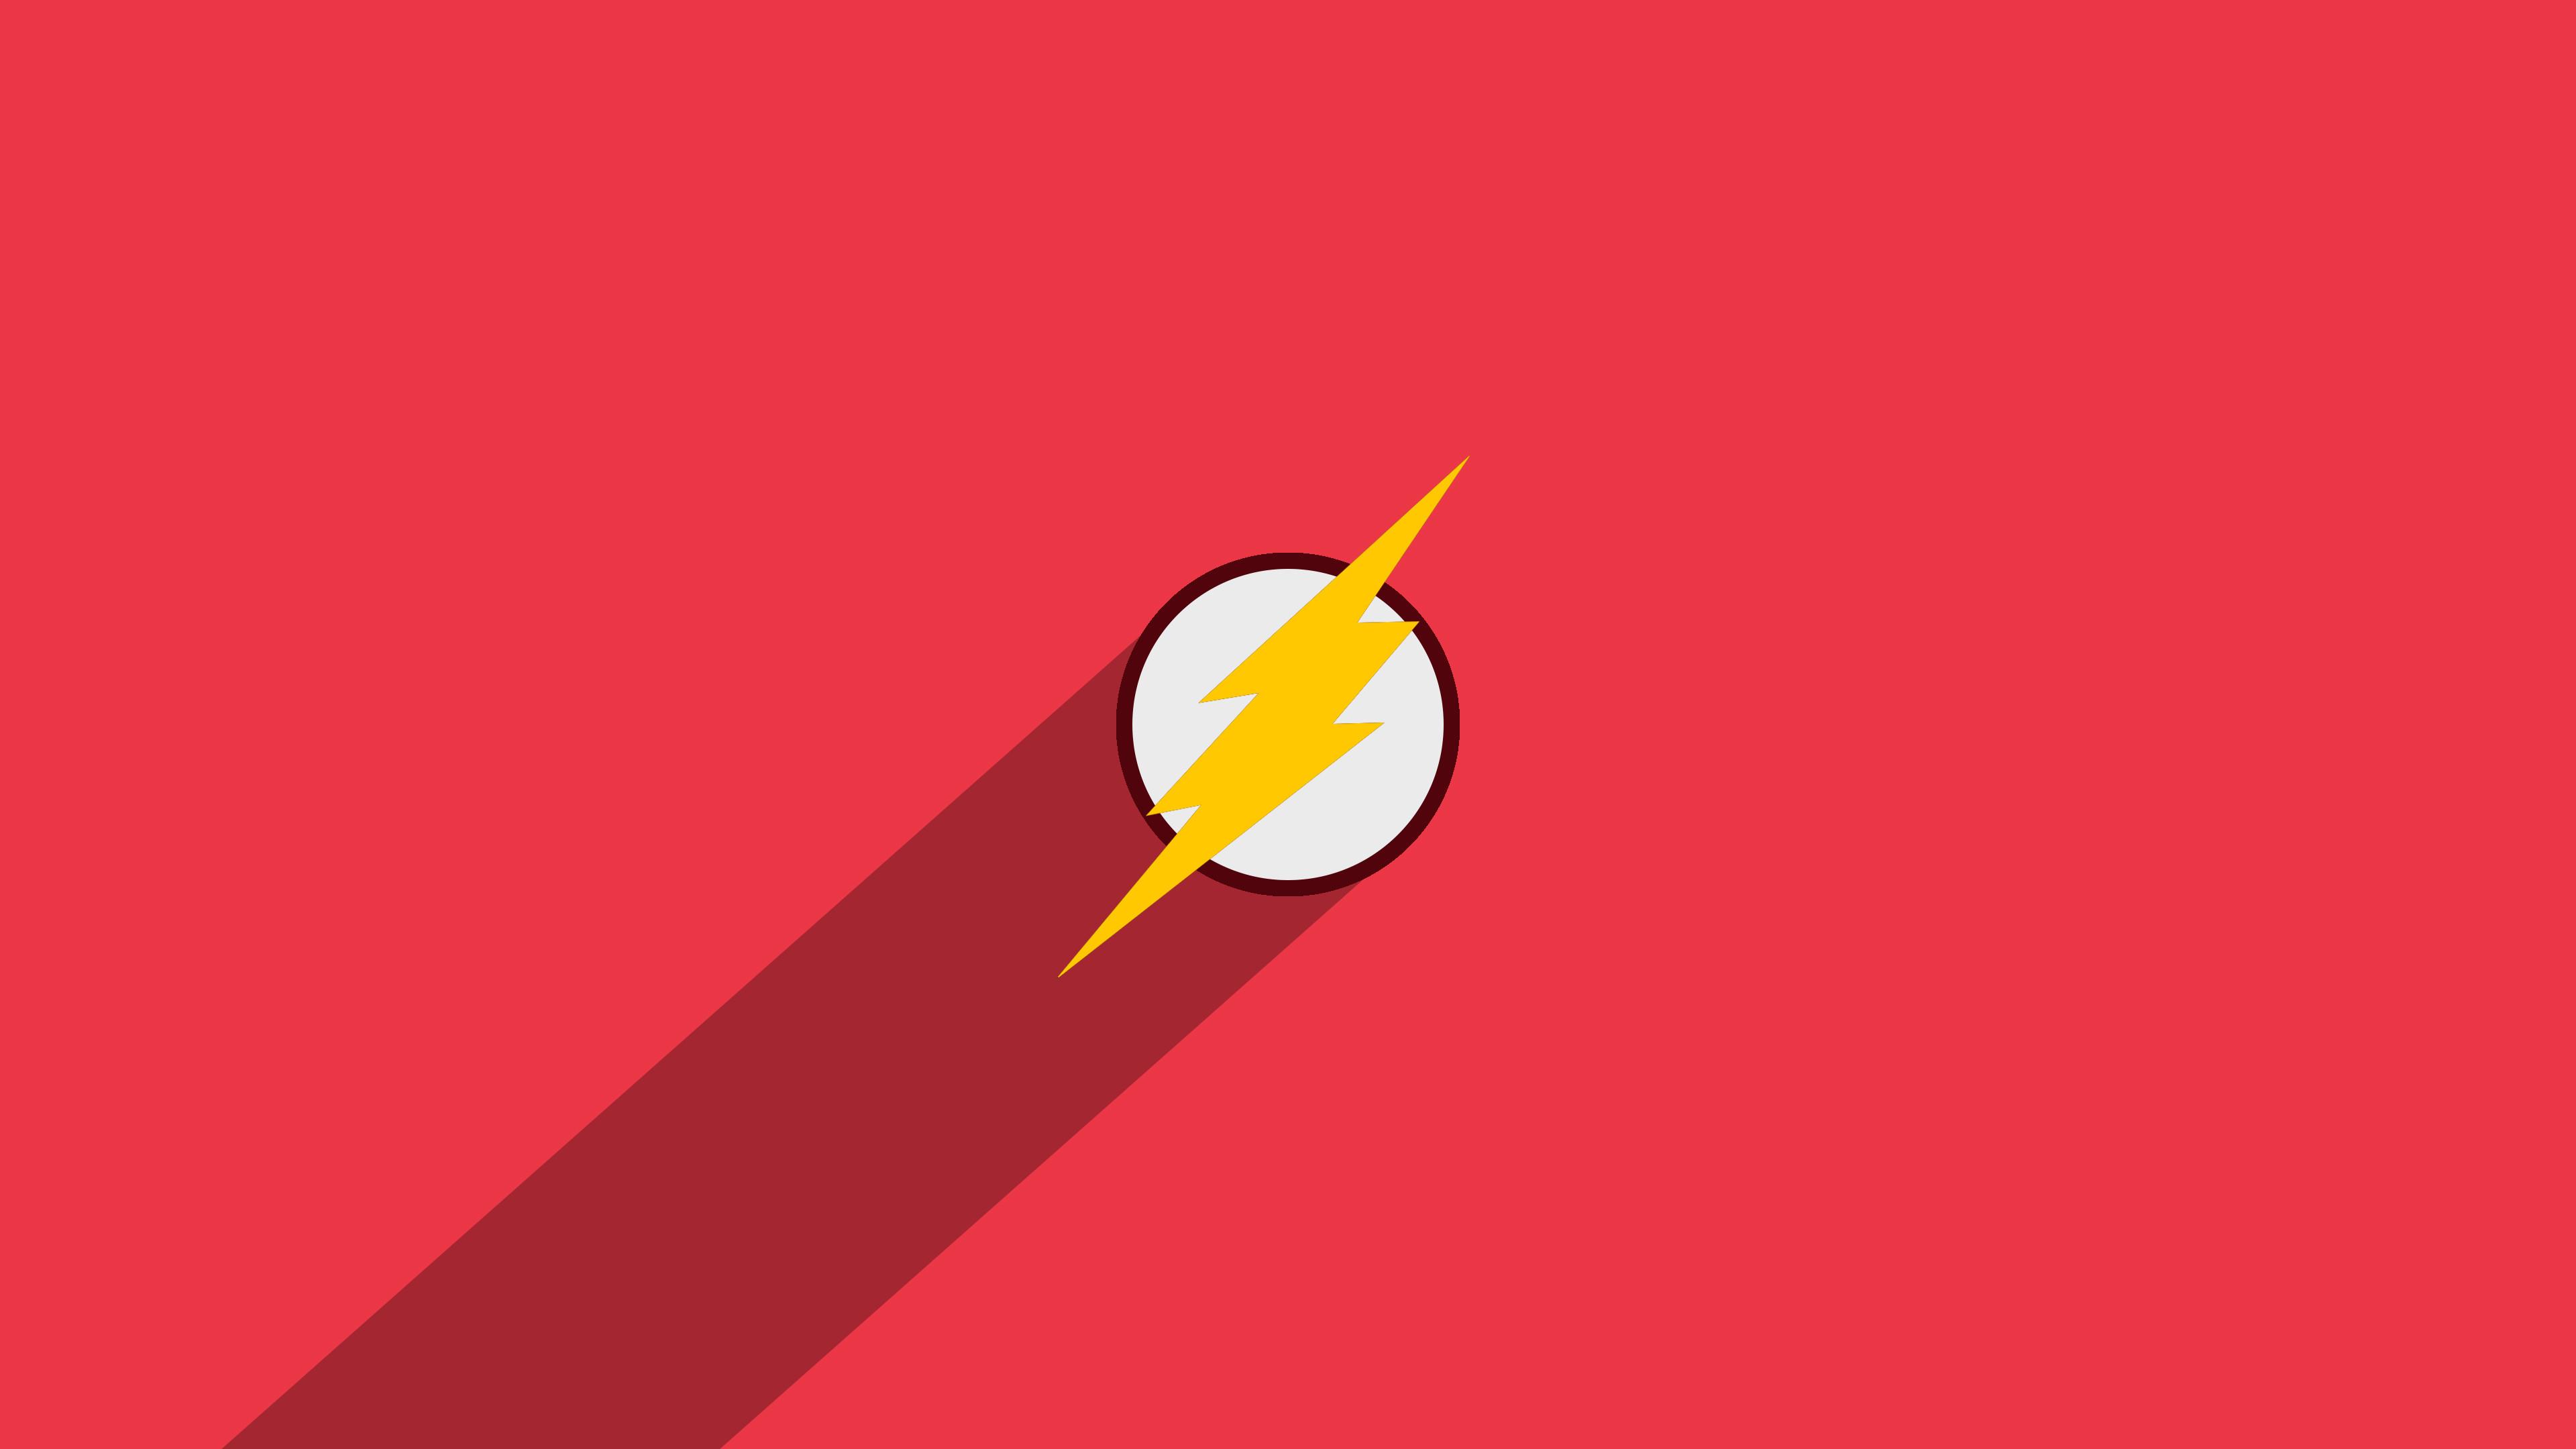 3840x2160 The Flash Desktop Wallpaper